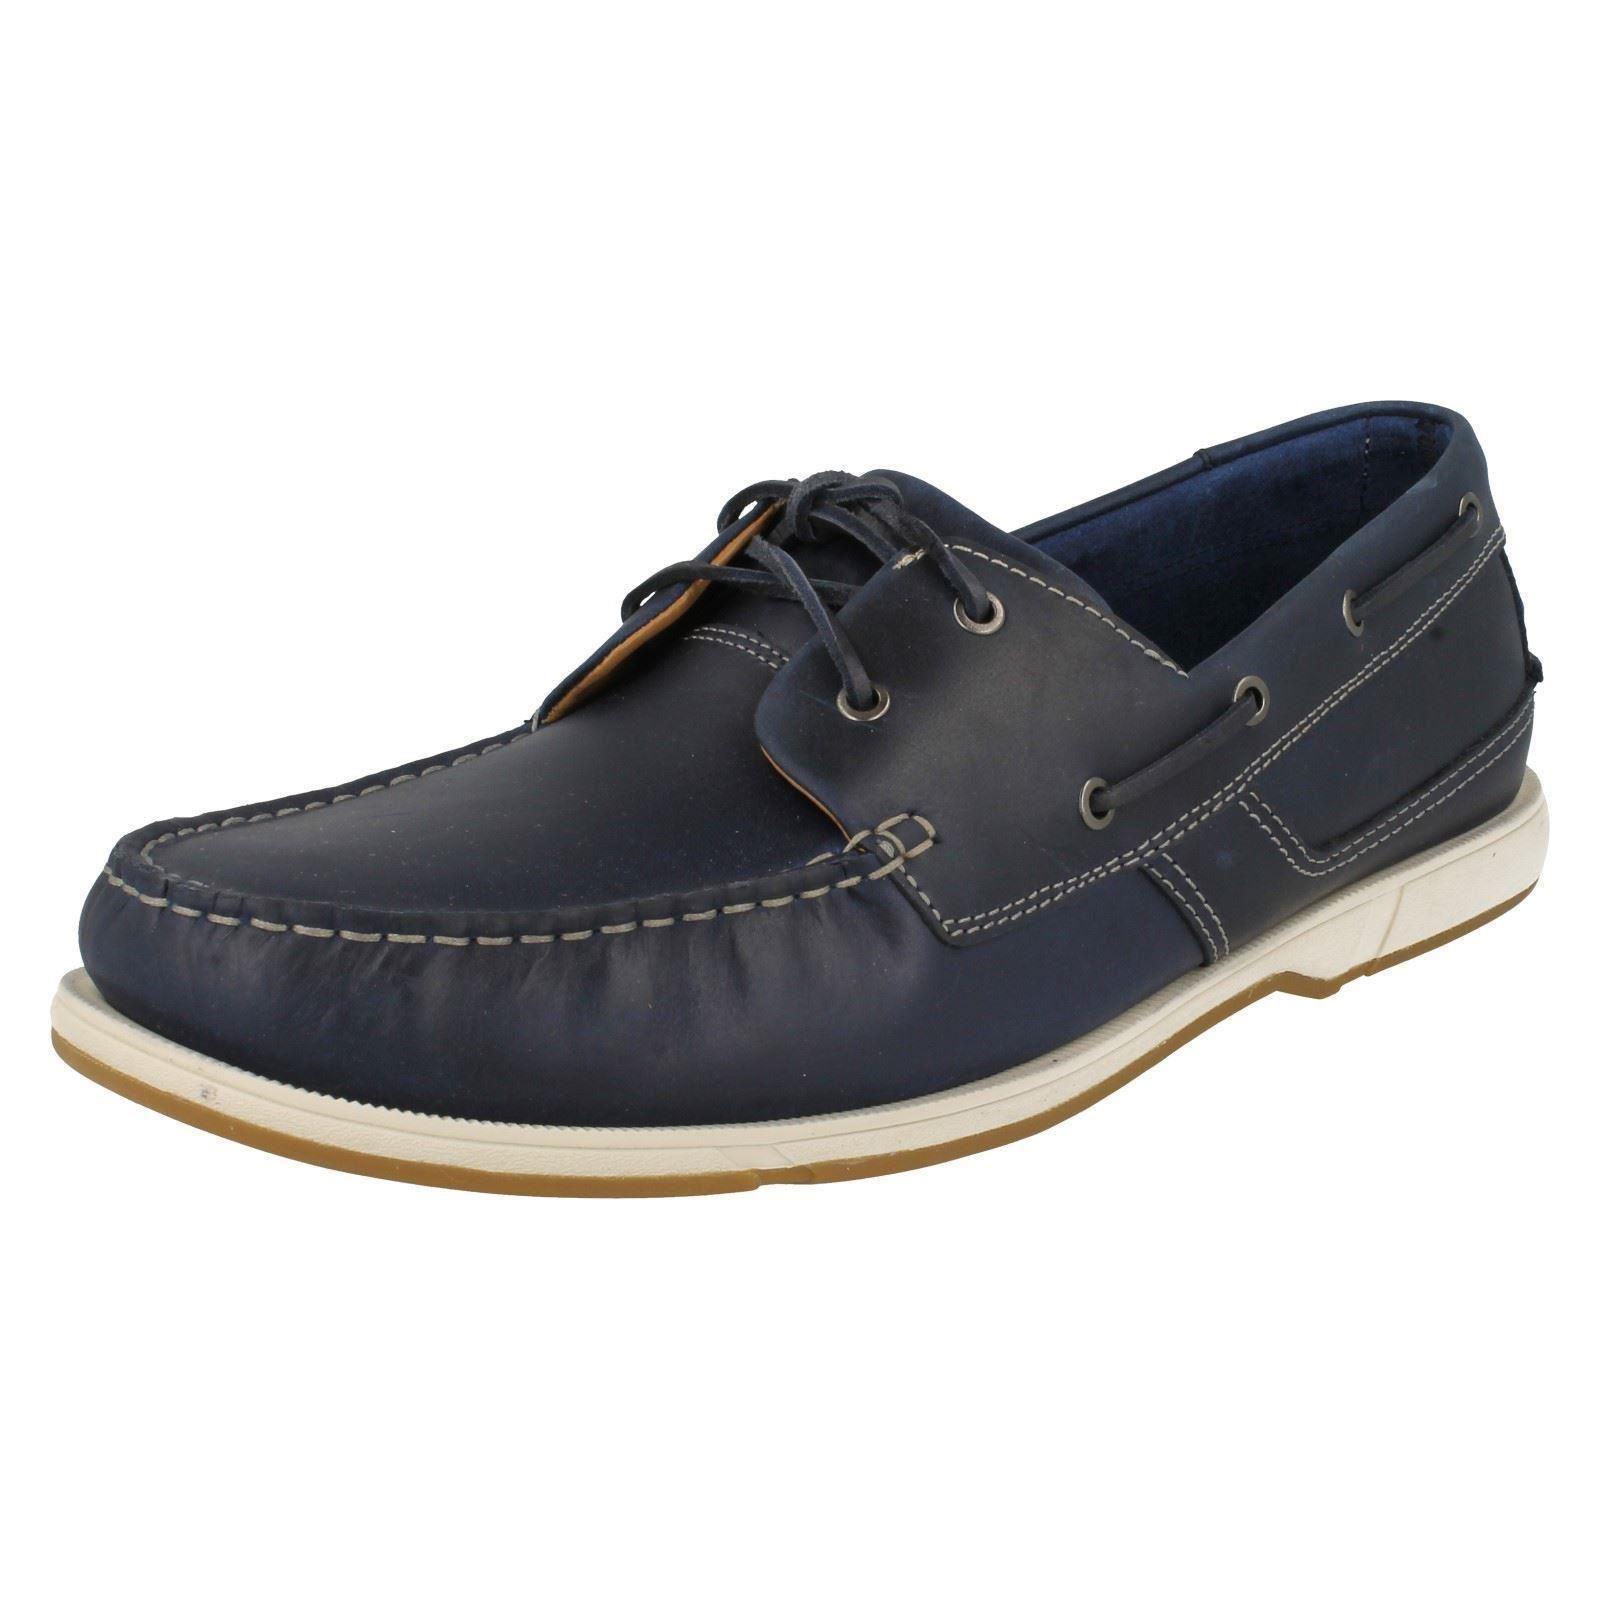 Uomo Smart/Casual Clarks Deck Style Smart/Casual Uomo Schuhes 'Fulmen Row' 800ea8